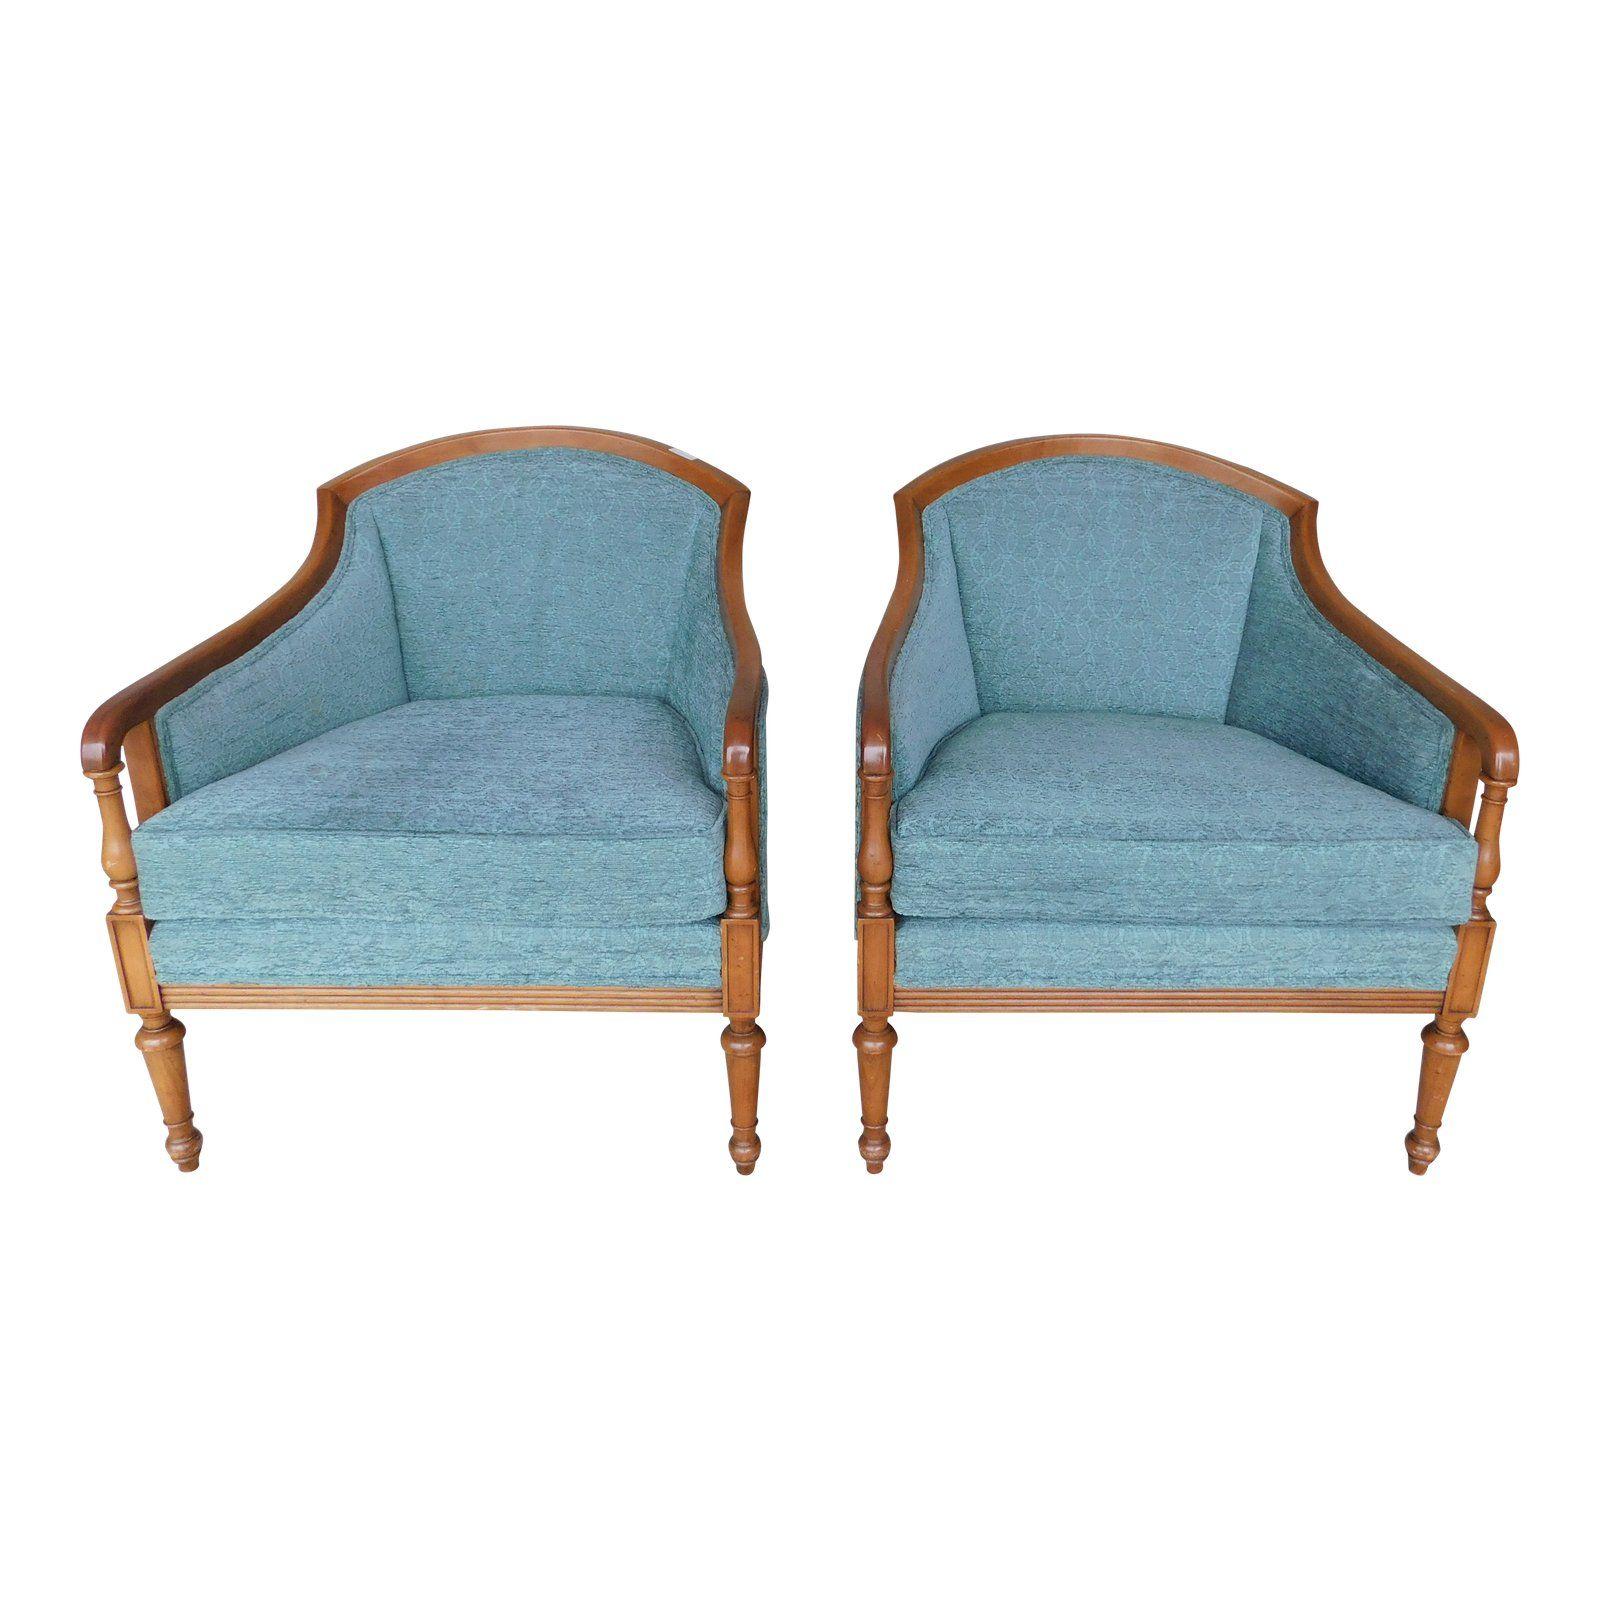 Groovy Baker Furniture Hollywood Regency Style Barrel Back Club Uwap Interior Chair Design Uwaporg